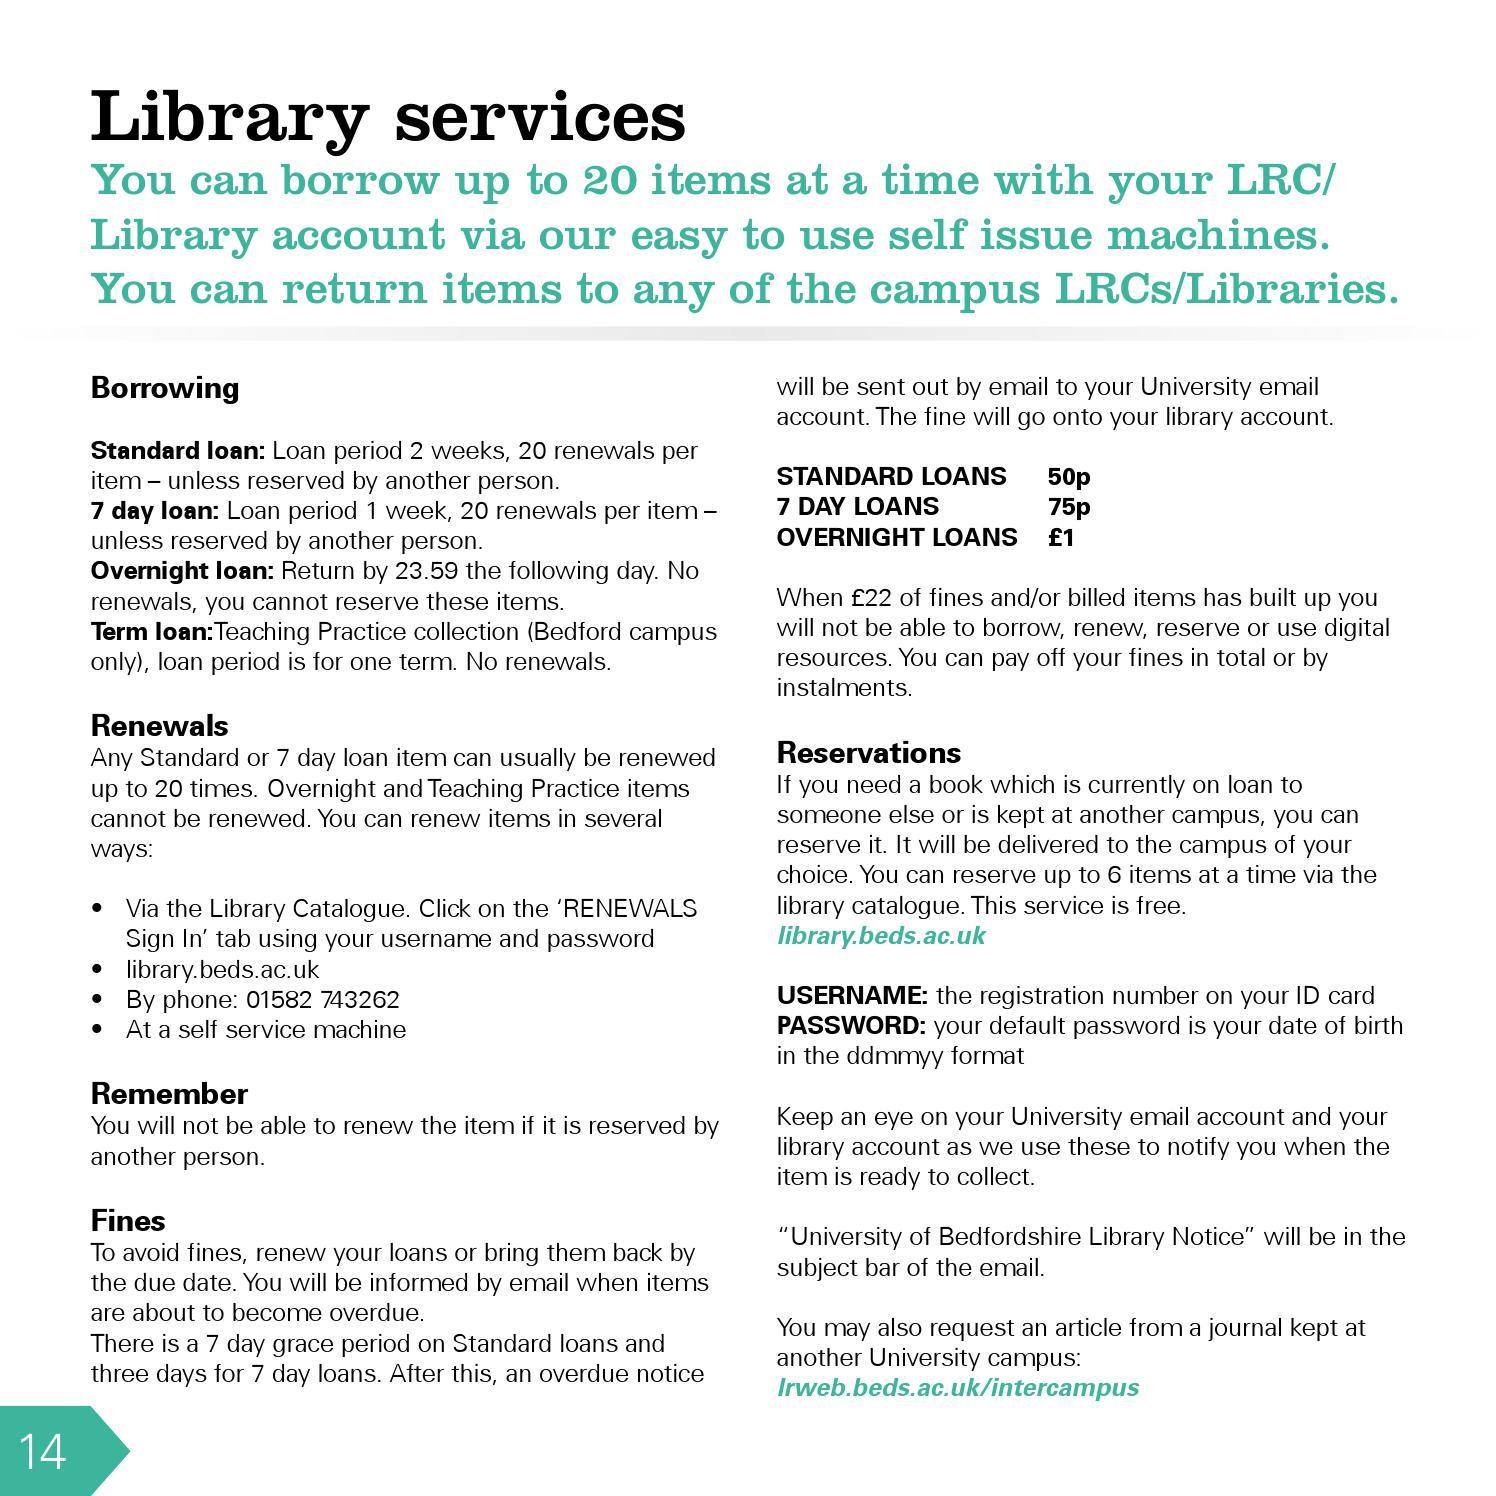 Library Handbook 2014/15 by University of Bedfordshire - issuu